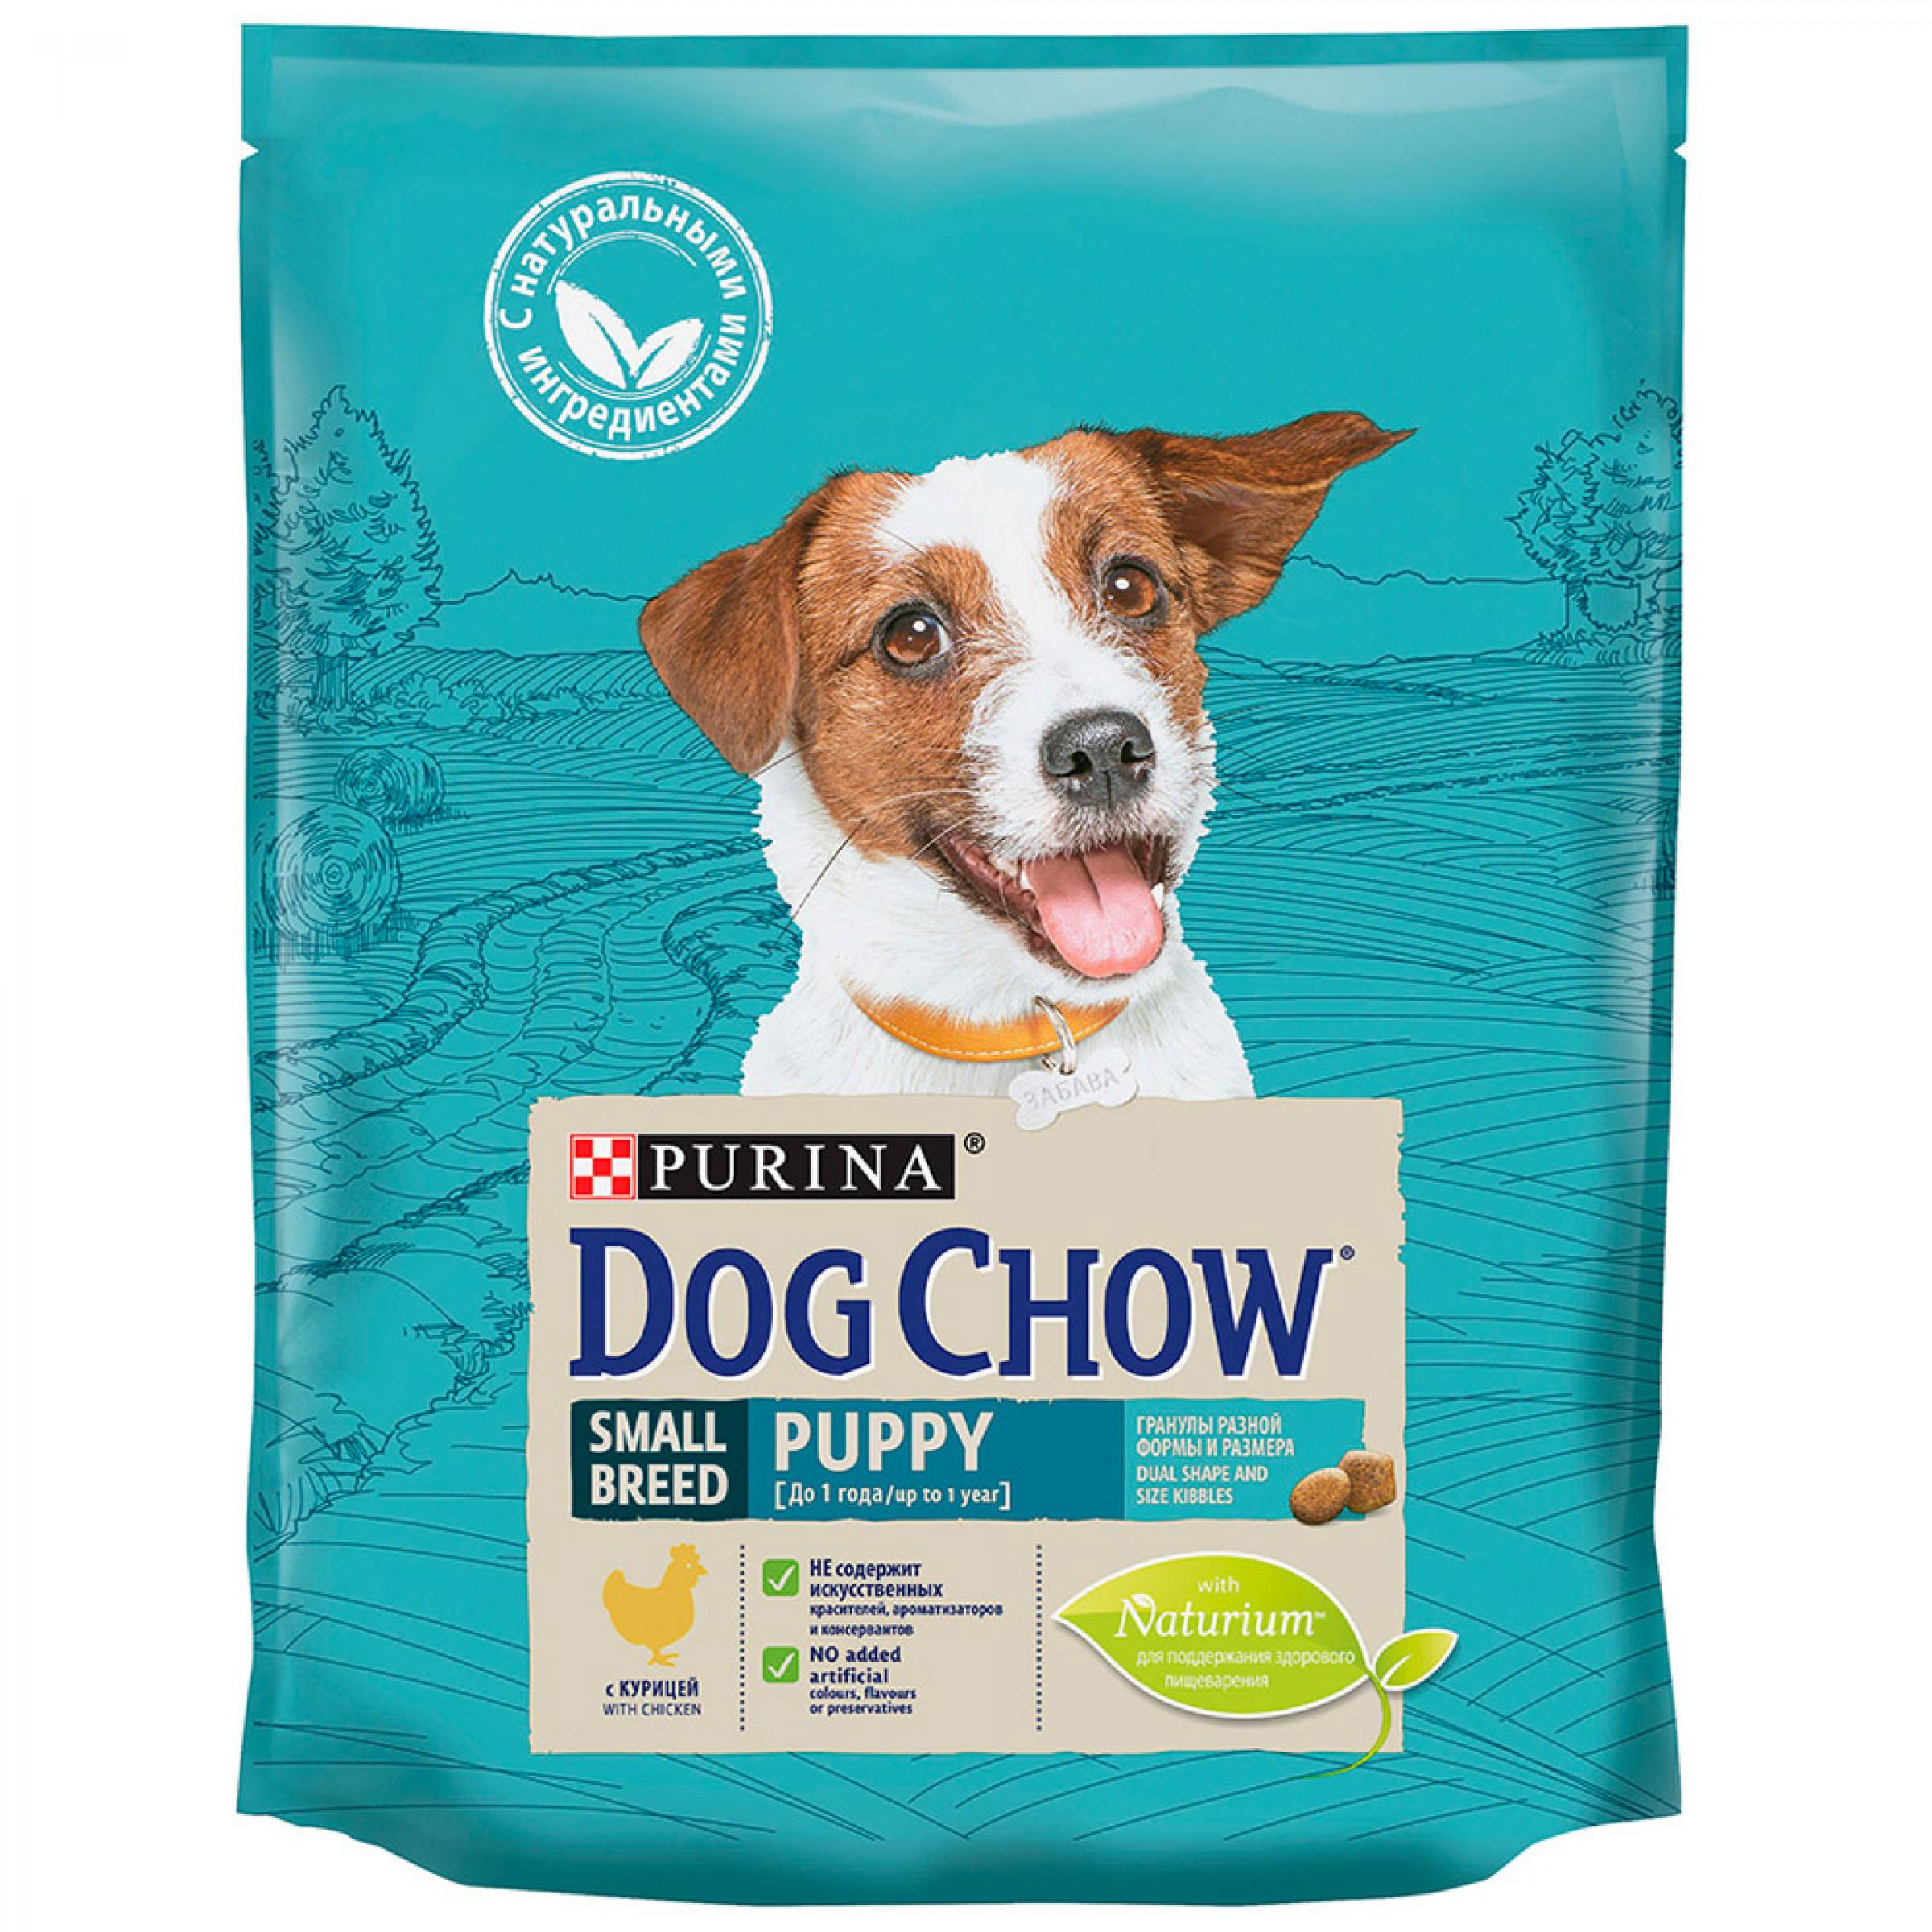 Сухой корм DOG CHOW для щенков мелких пород курица, 800гр